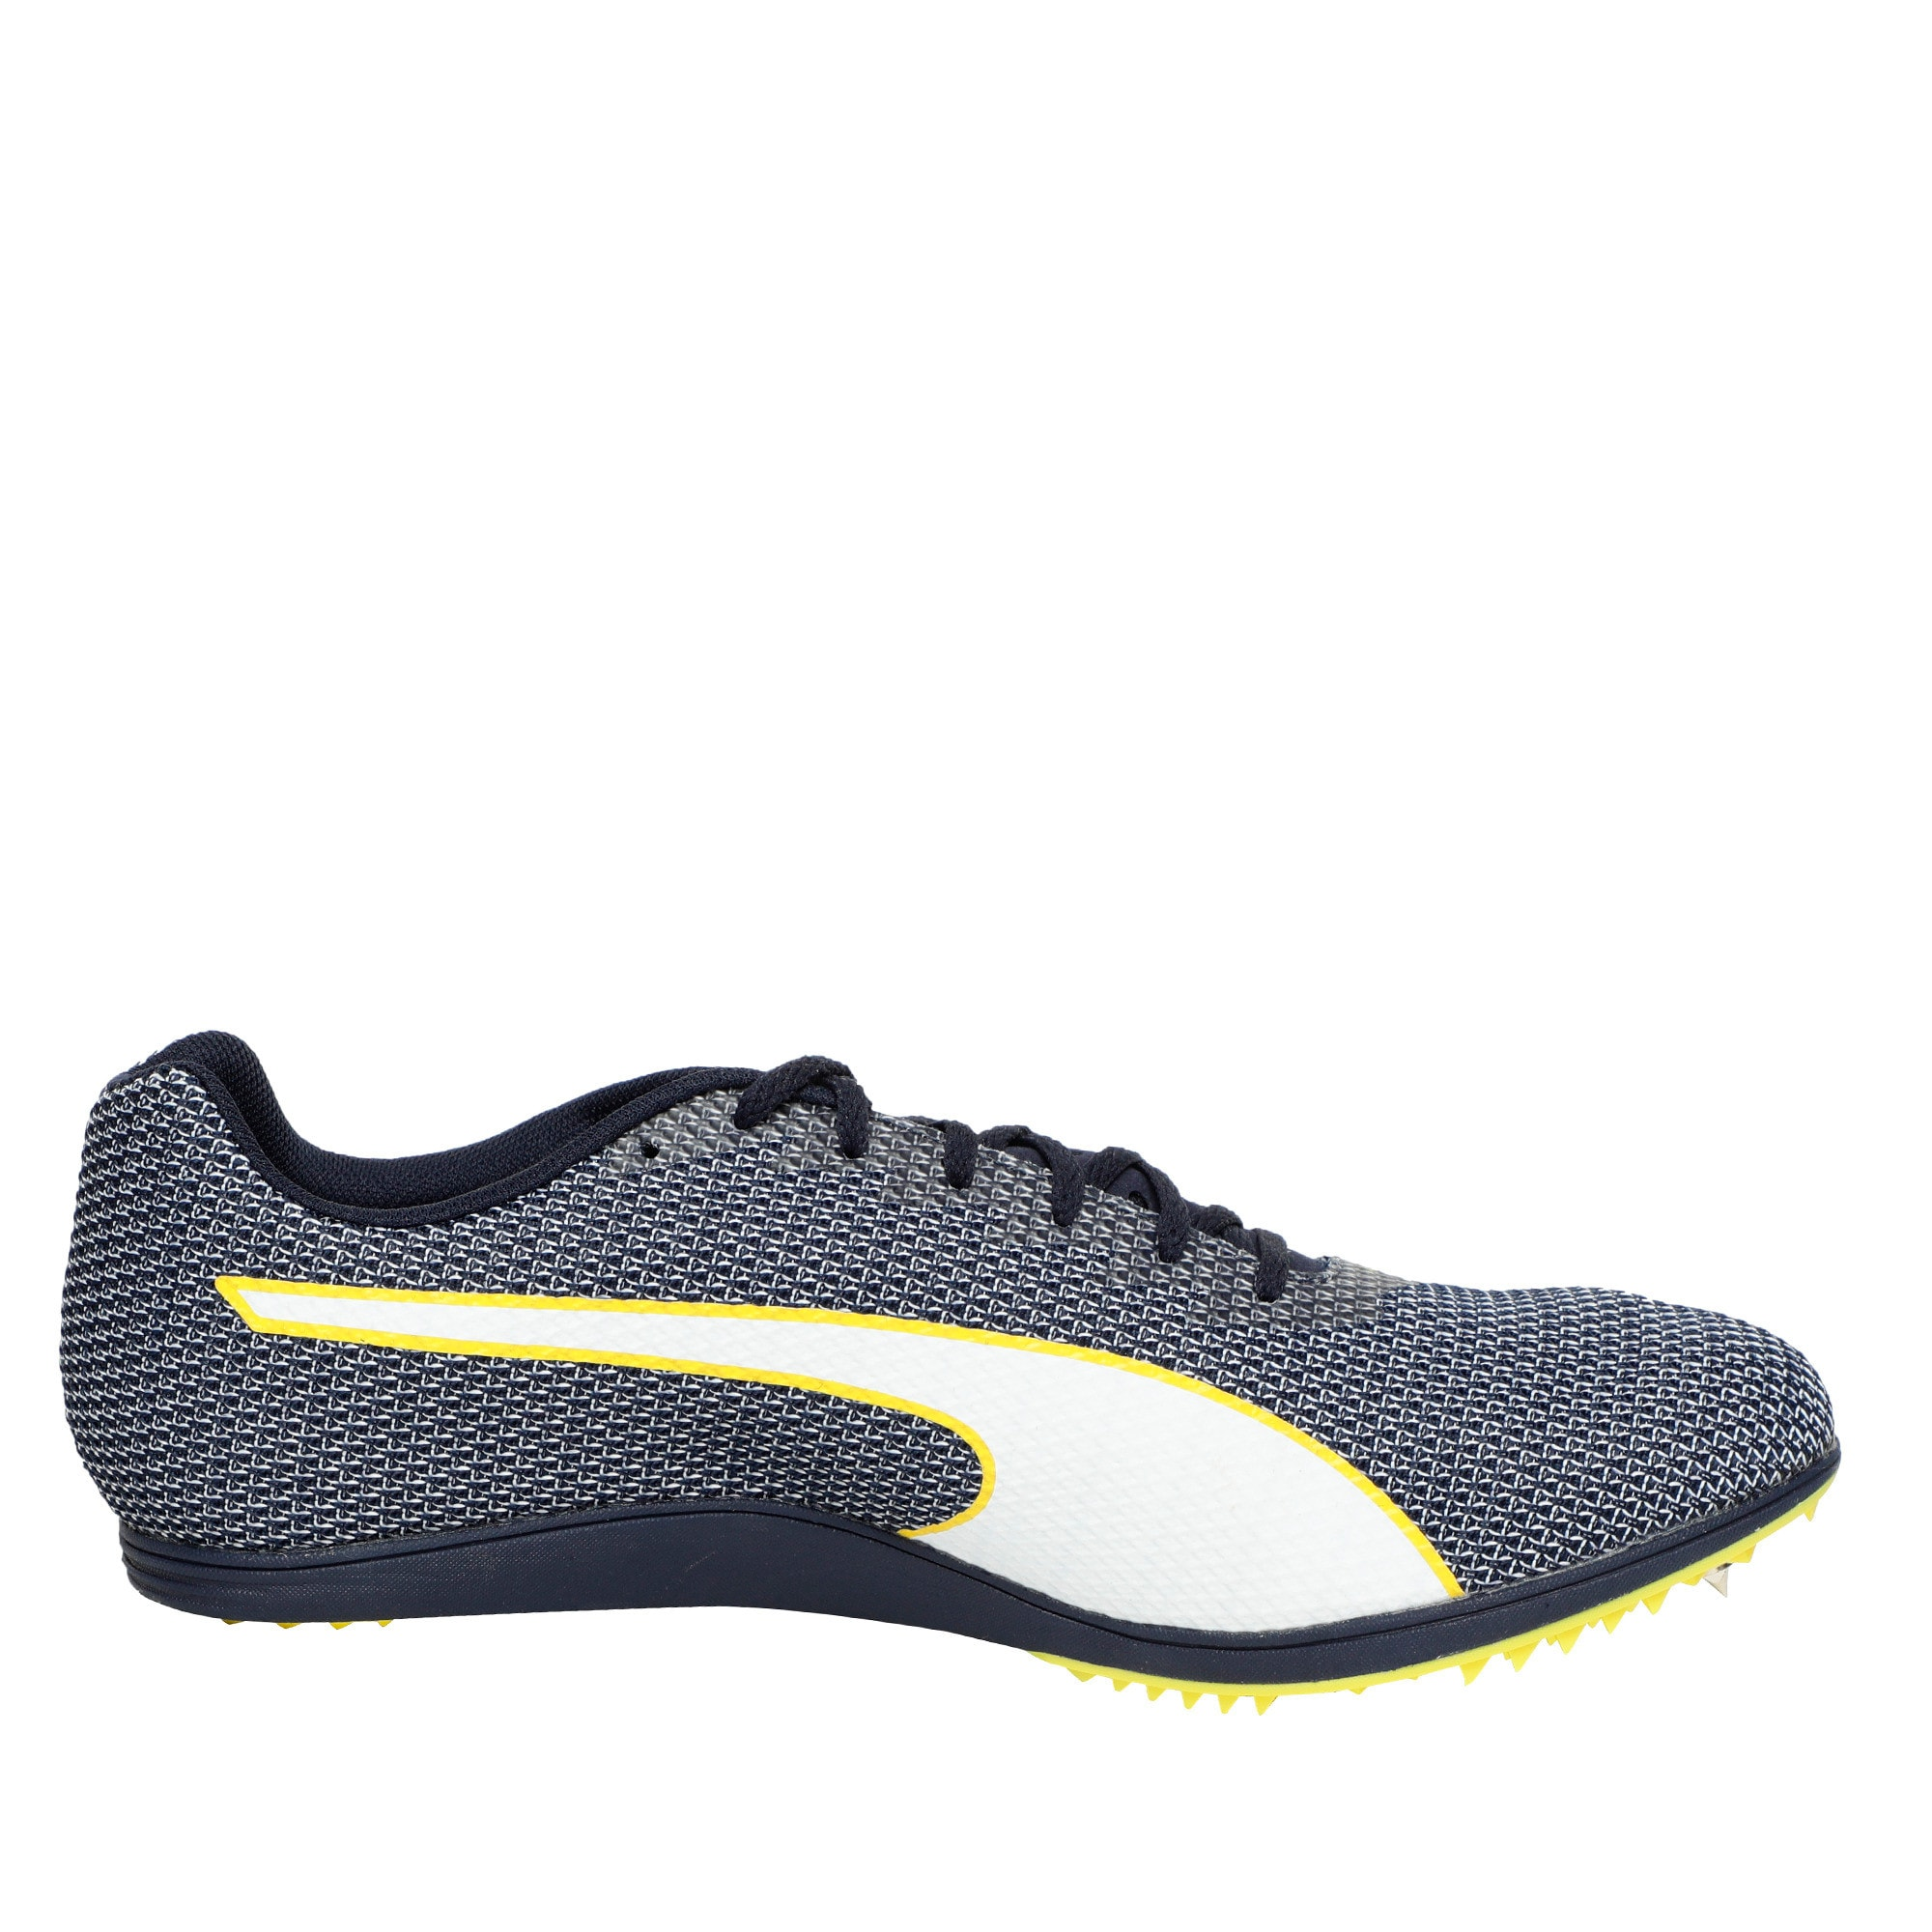 Thumbnail 5 of evoSPEED Distance 8 Men's Running Shoes, Peacoat-Blazing Yellow, medium-IND